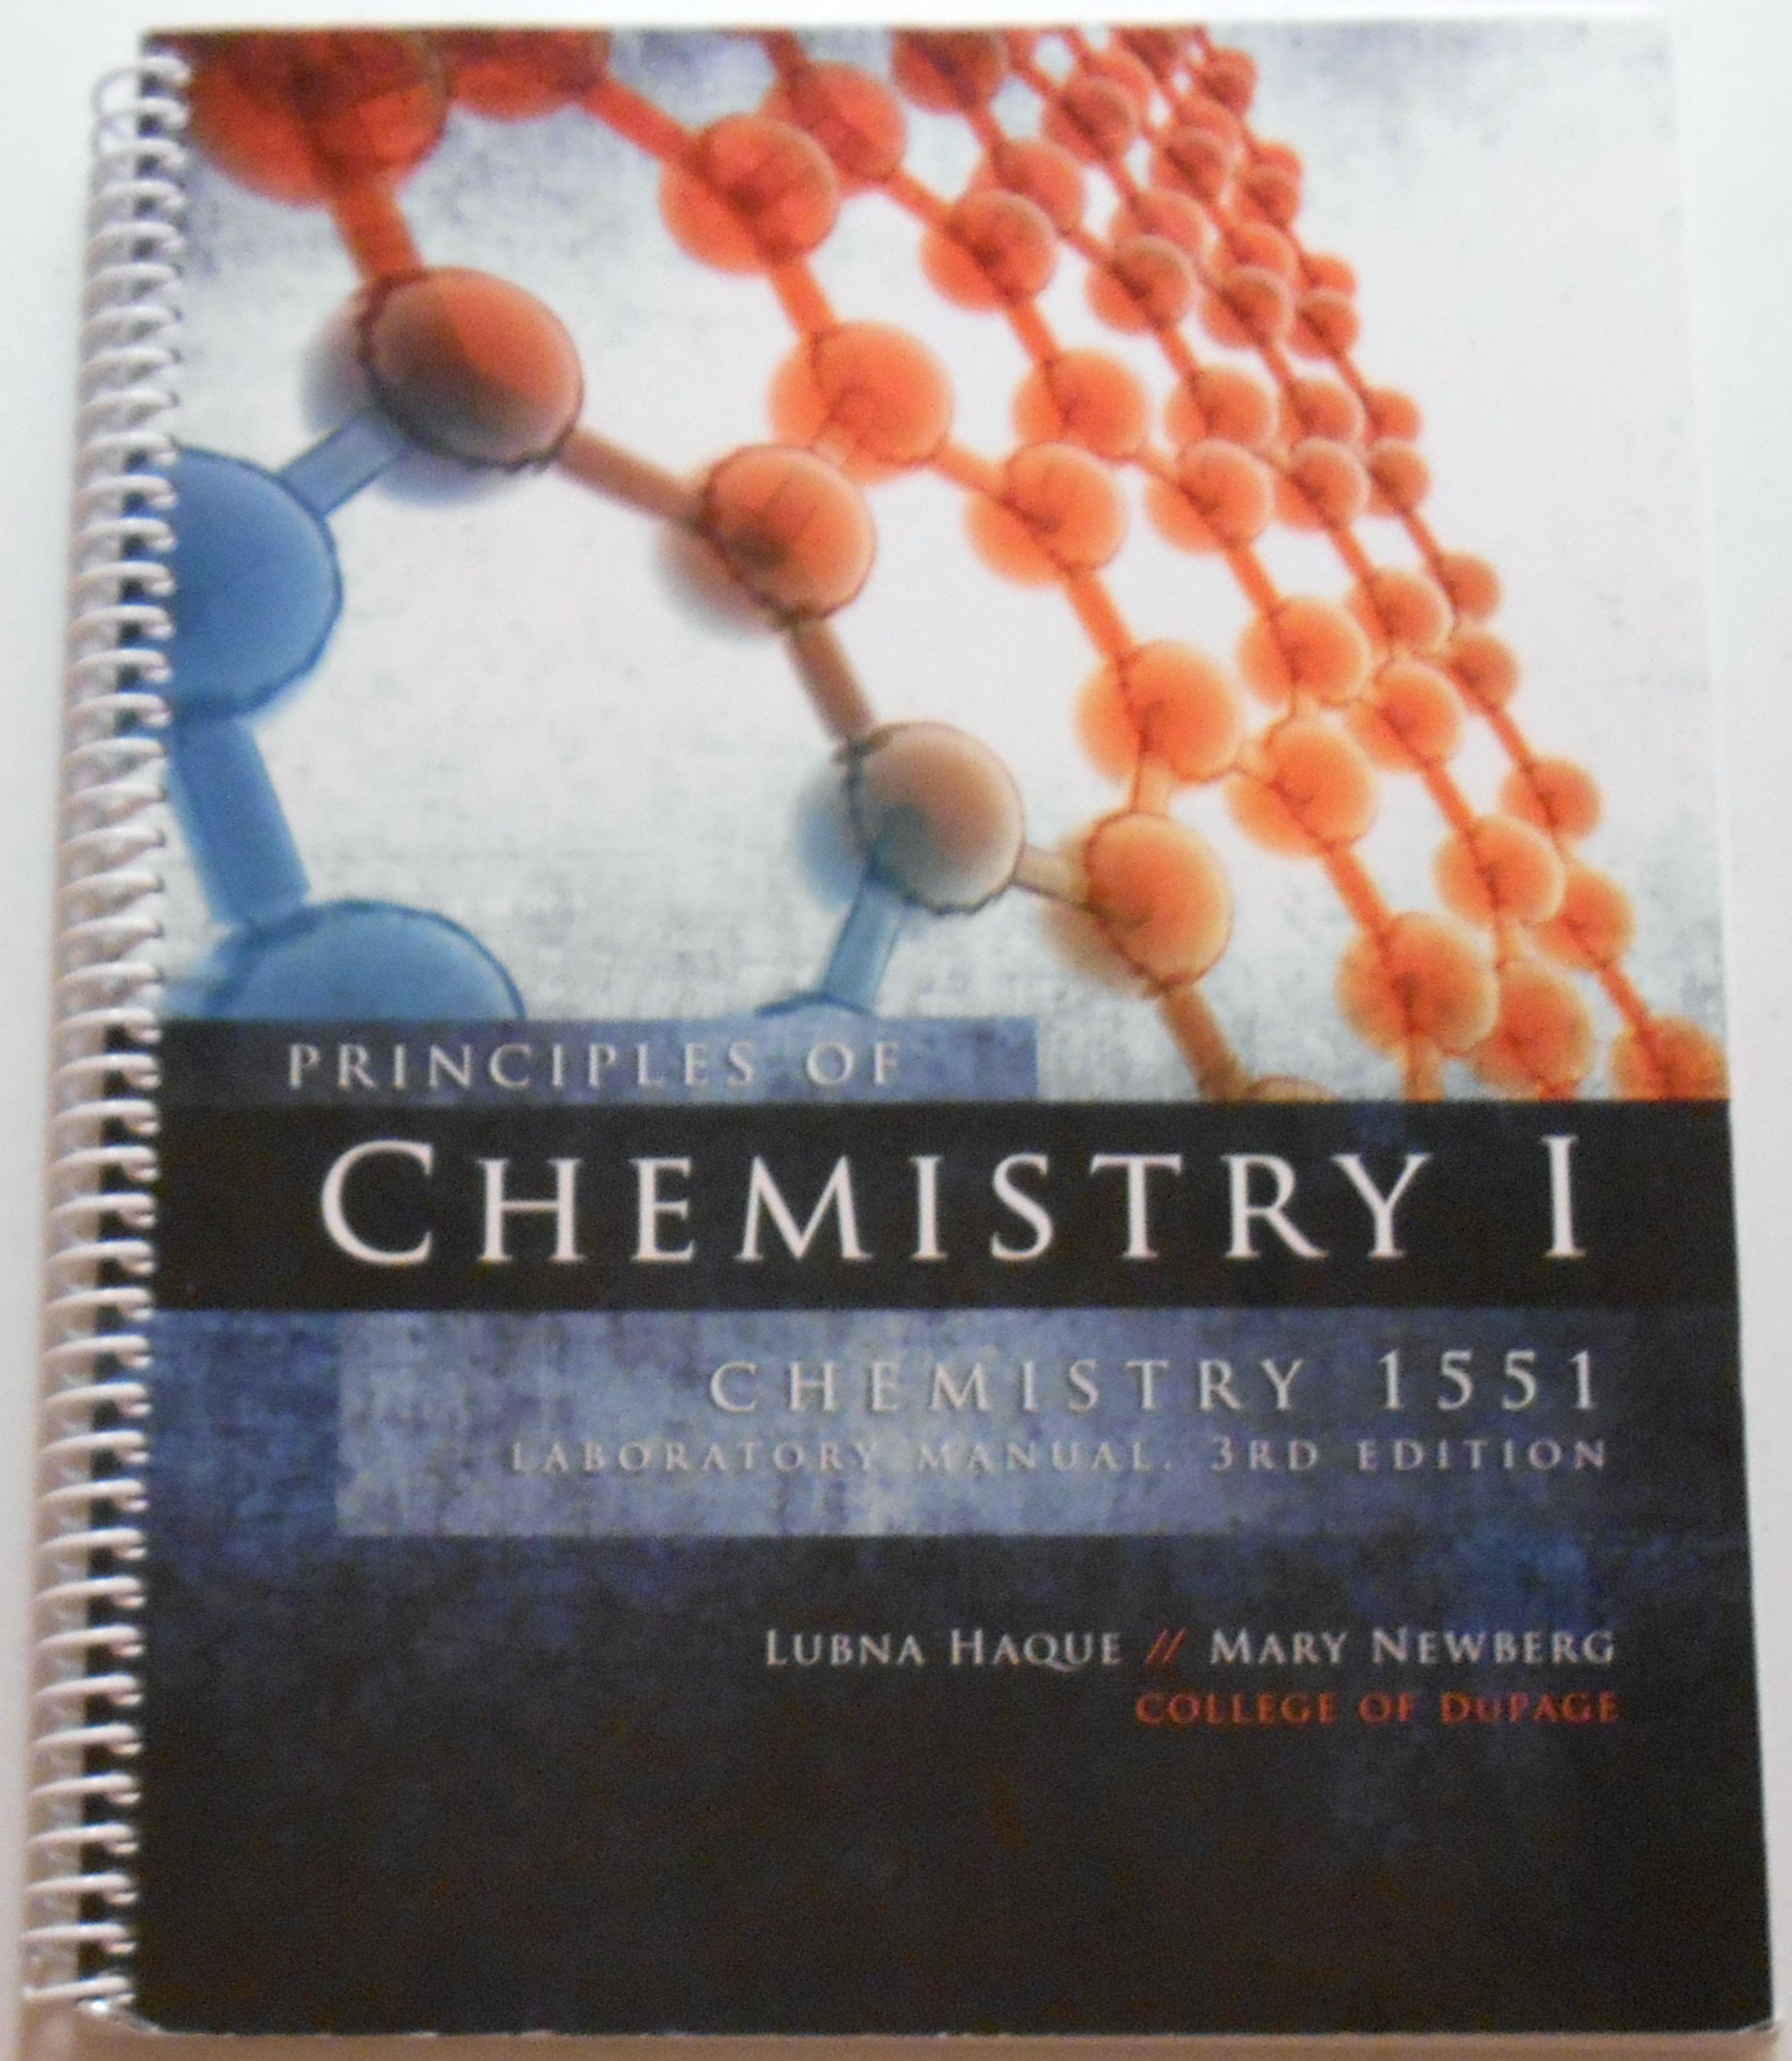 Principles of Chemistry I: Mary Newberg Lubna Haque: 9781599846002:  Amazon.com: Books